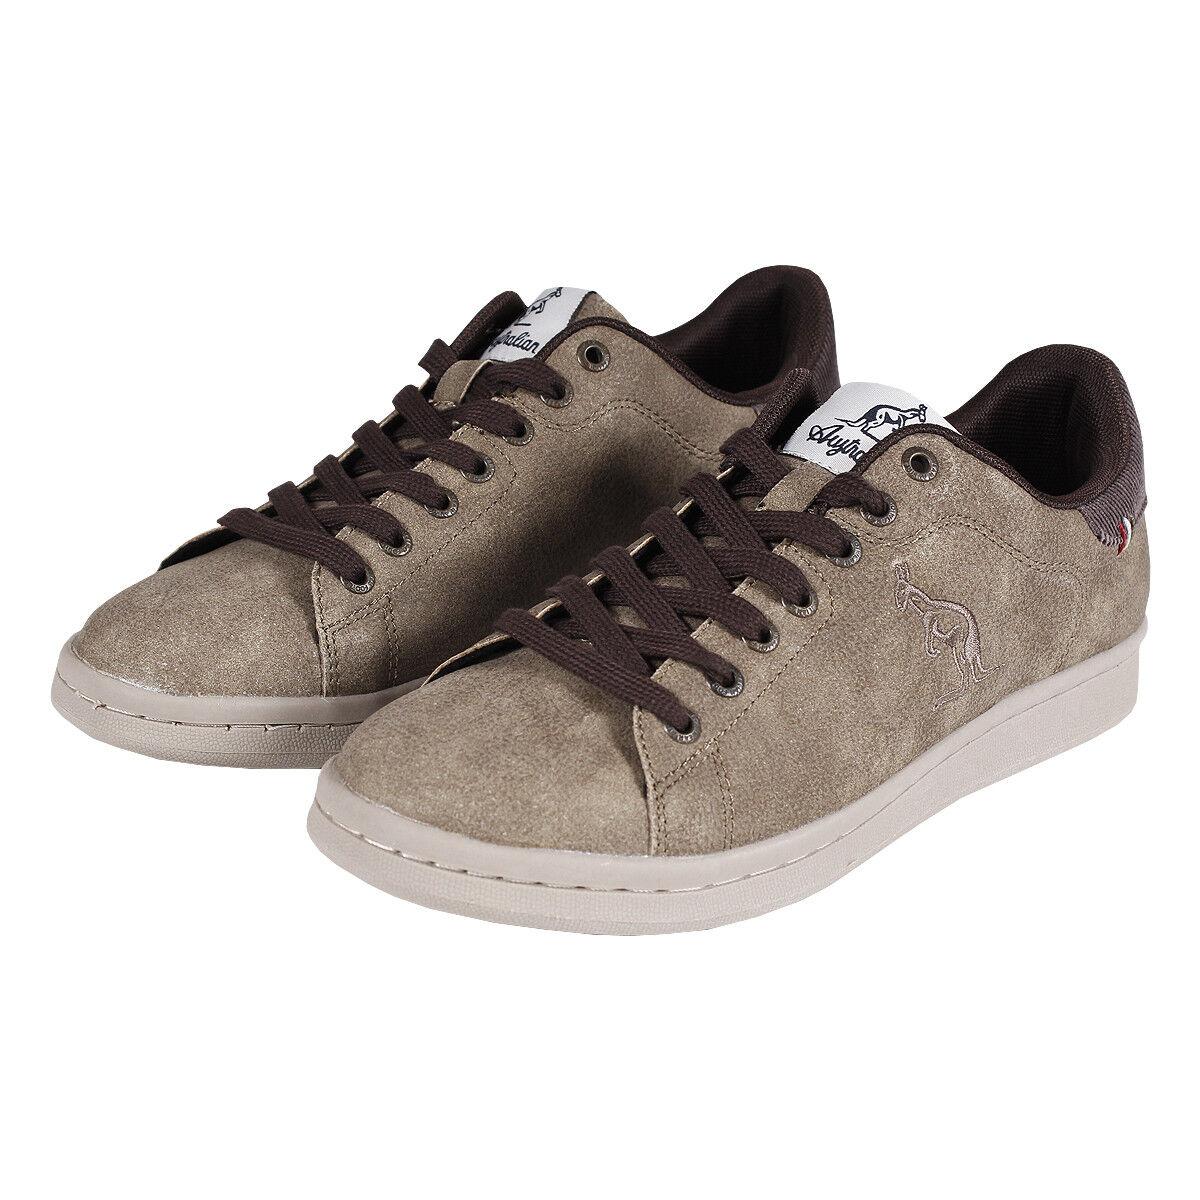 shoes men Australian Sneakers Basse Beige Nabuk Casual Lacci Stringhe SARANI